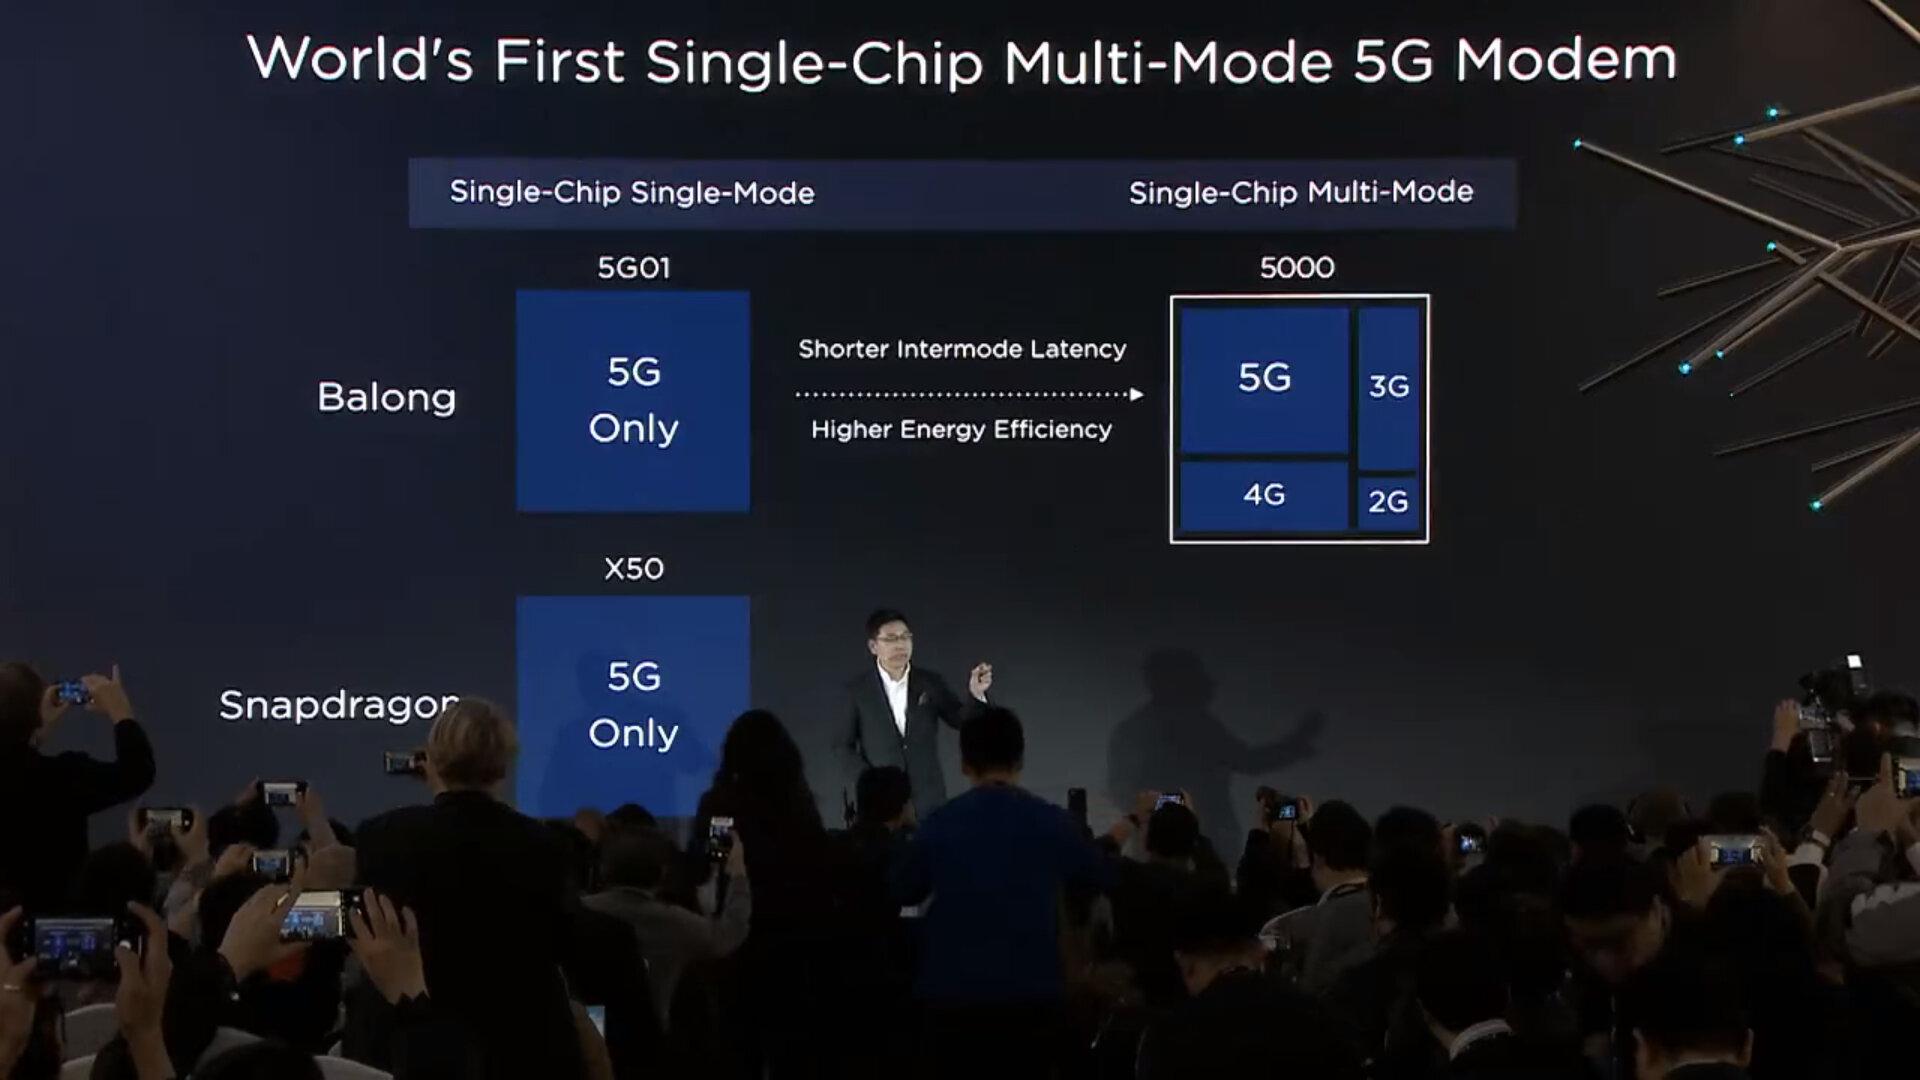 Huawei sieht das Balong vor dem Snapdragon X50